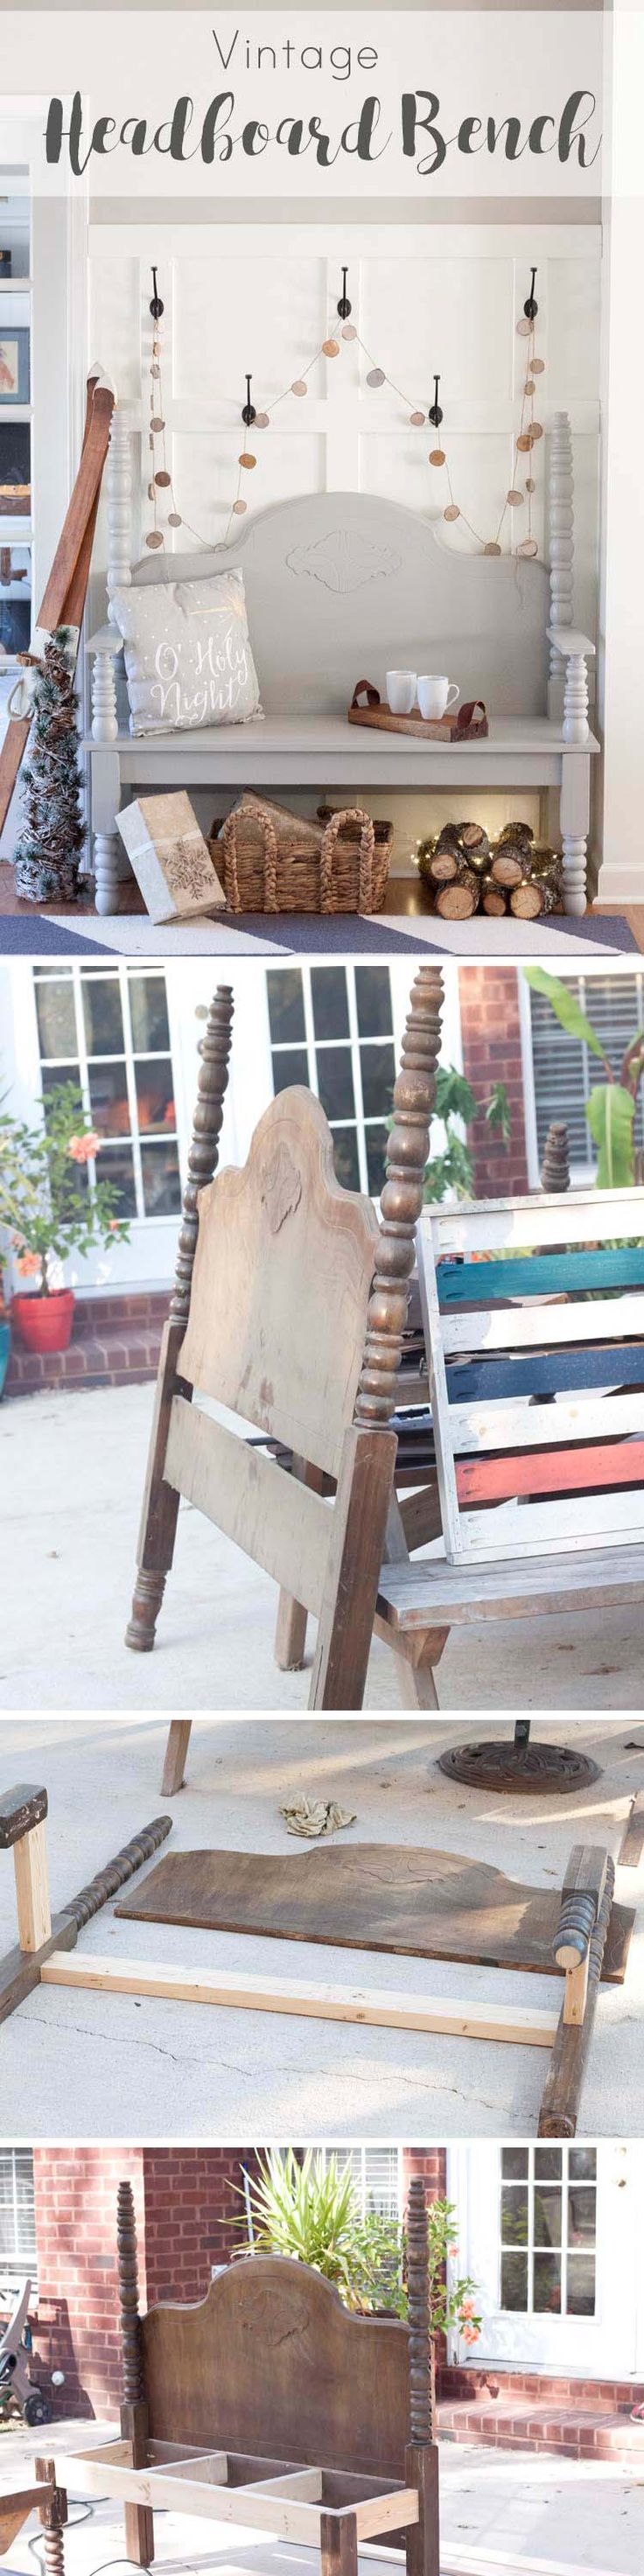 DIY Vintage Headboard Bench - Southern Revivals